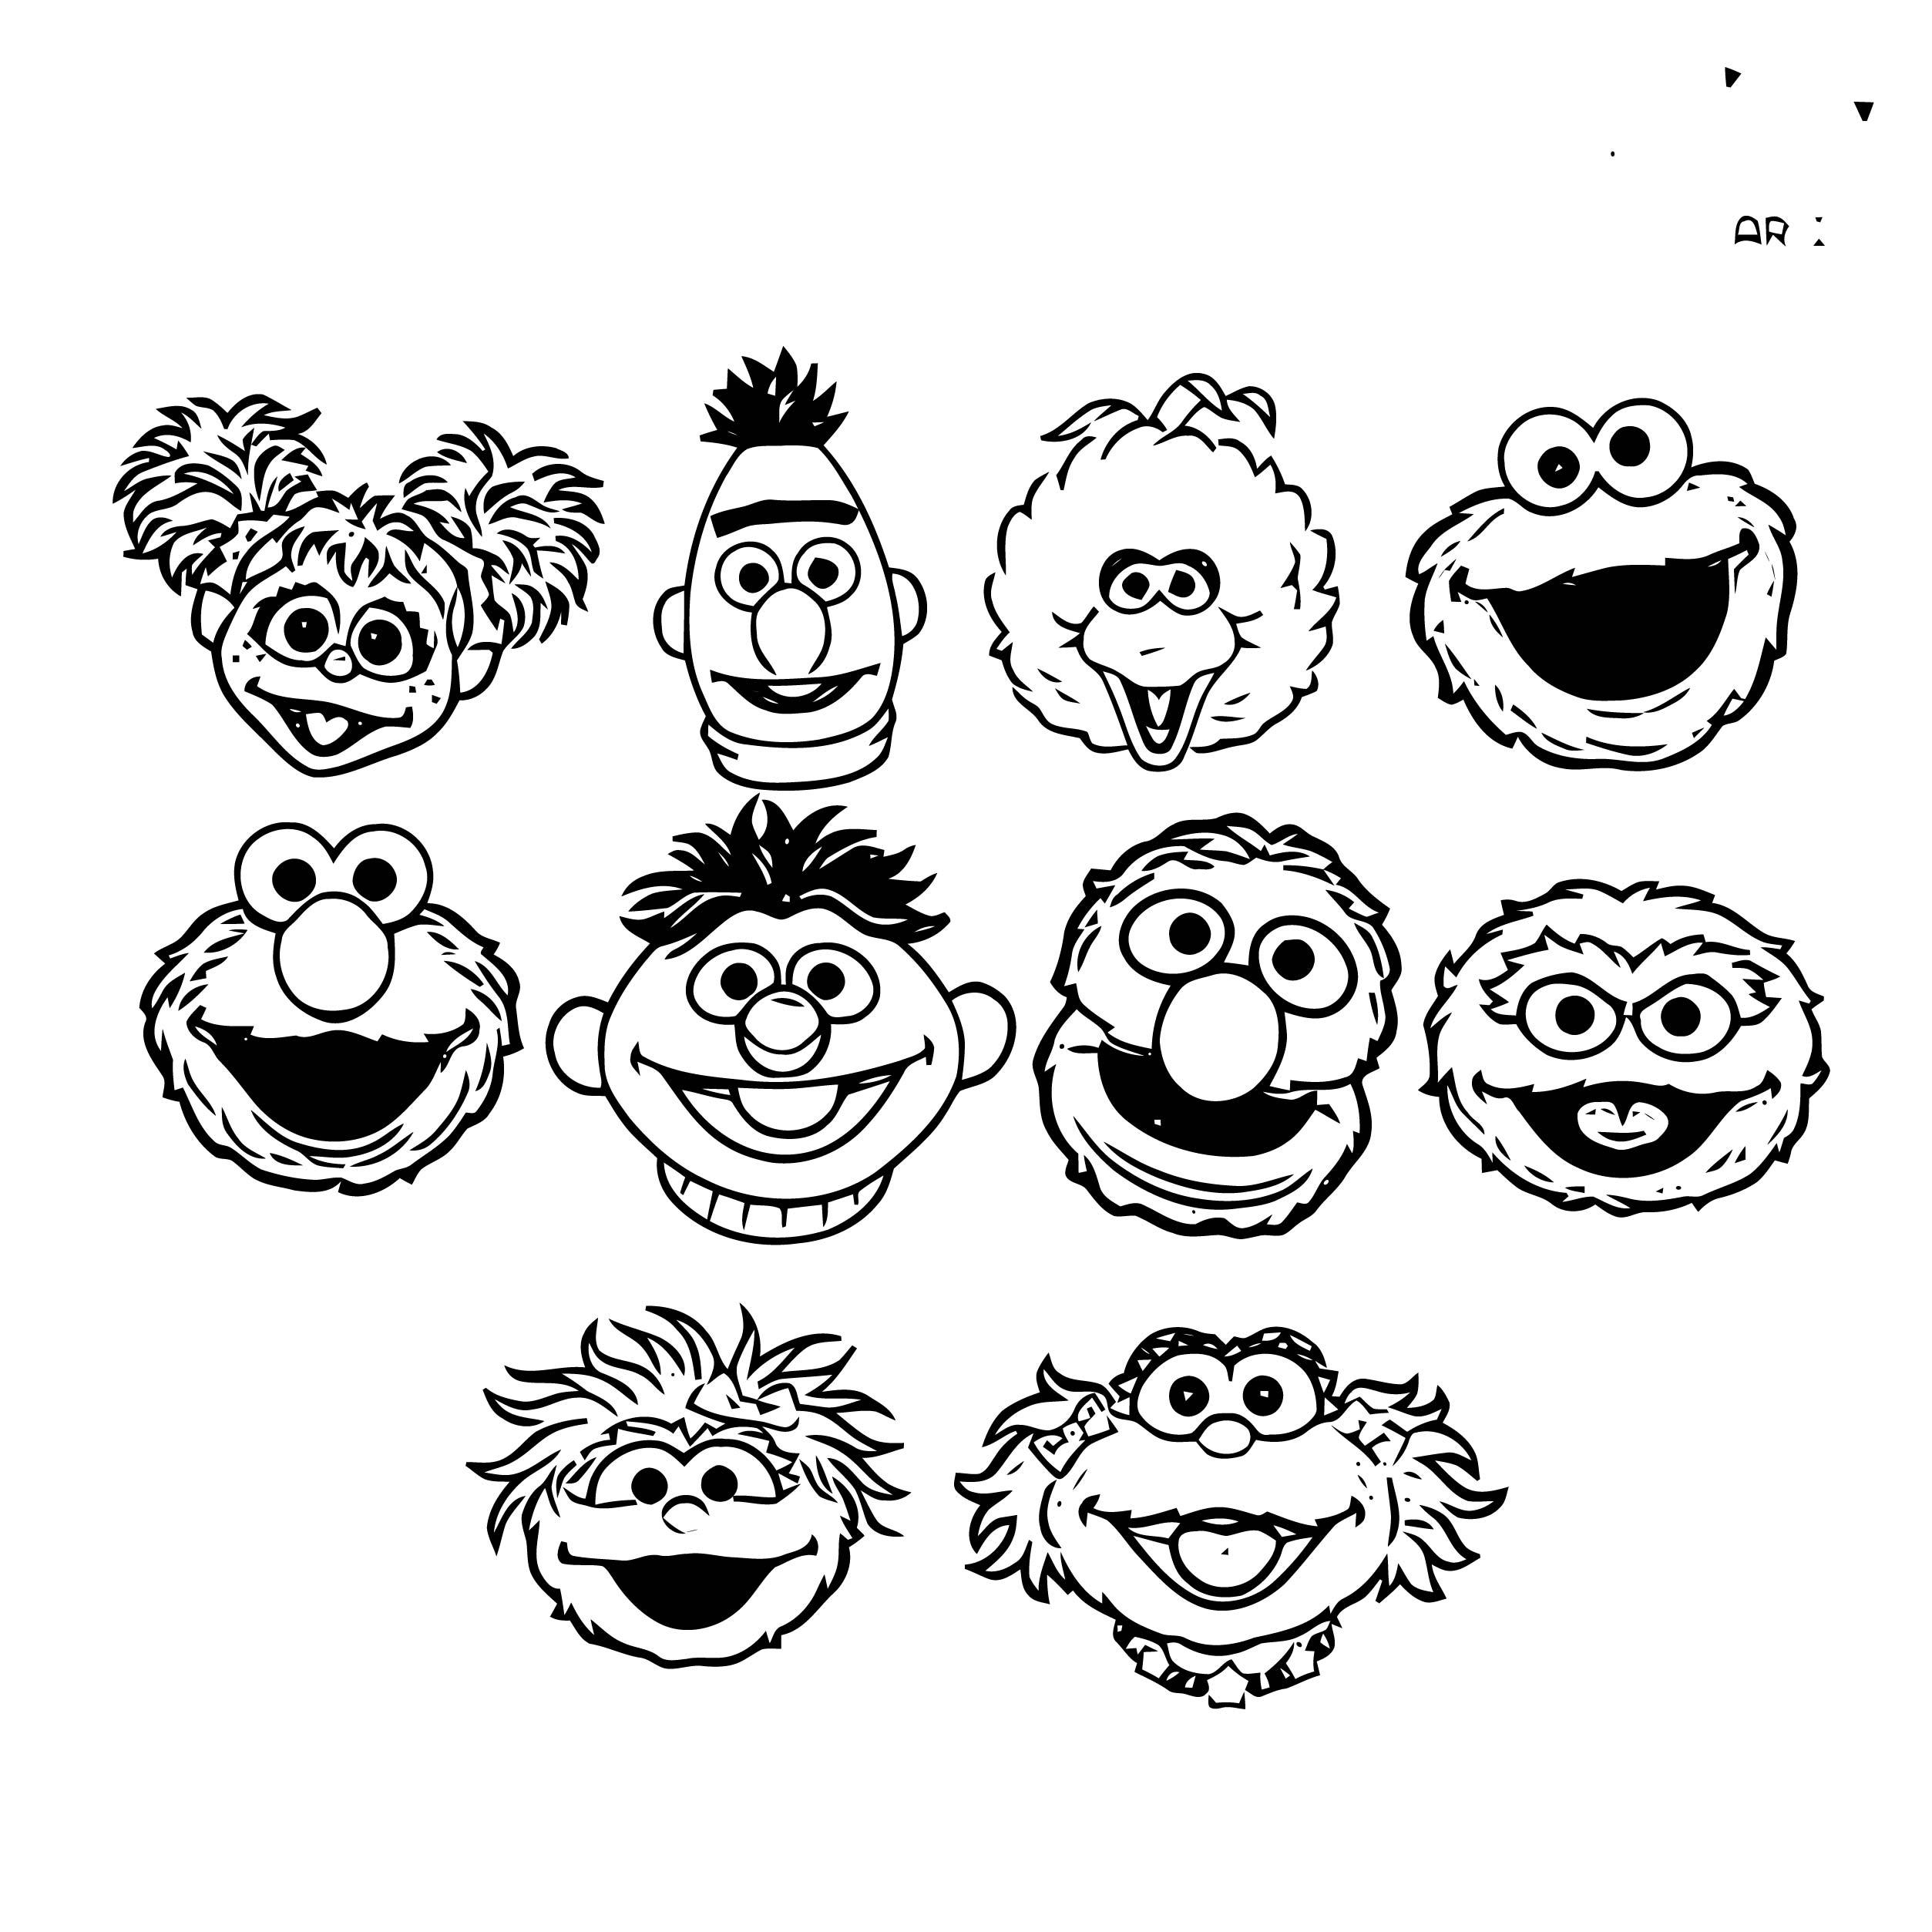 Sesame Street Elmo Coloring Page WeColoringPage 58